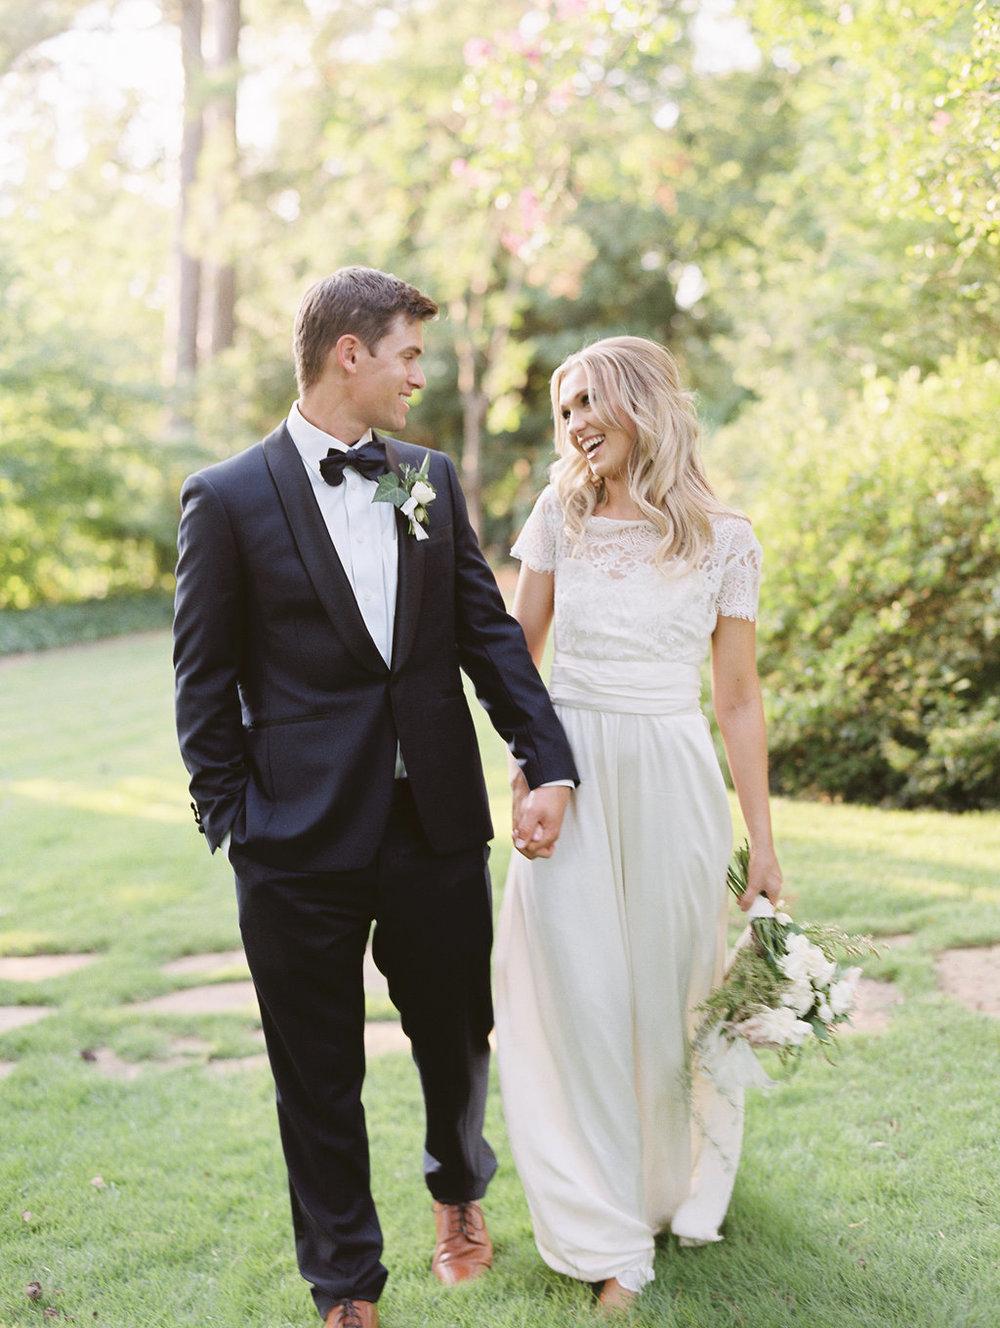 athens-founders-memorial-garden-wedding-photography-hannah-forsberg-atlanta-wedding-photographer-1.jpg